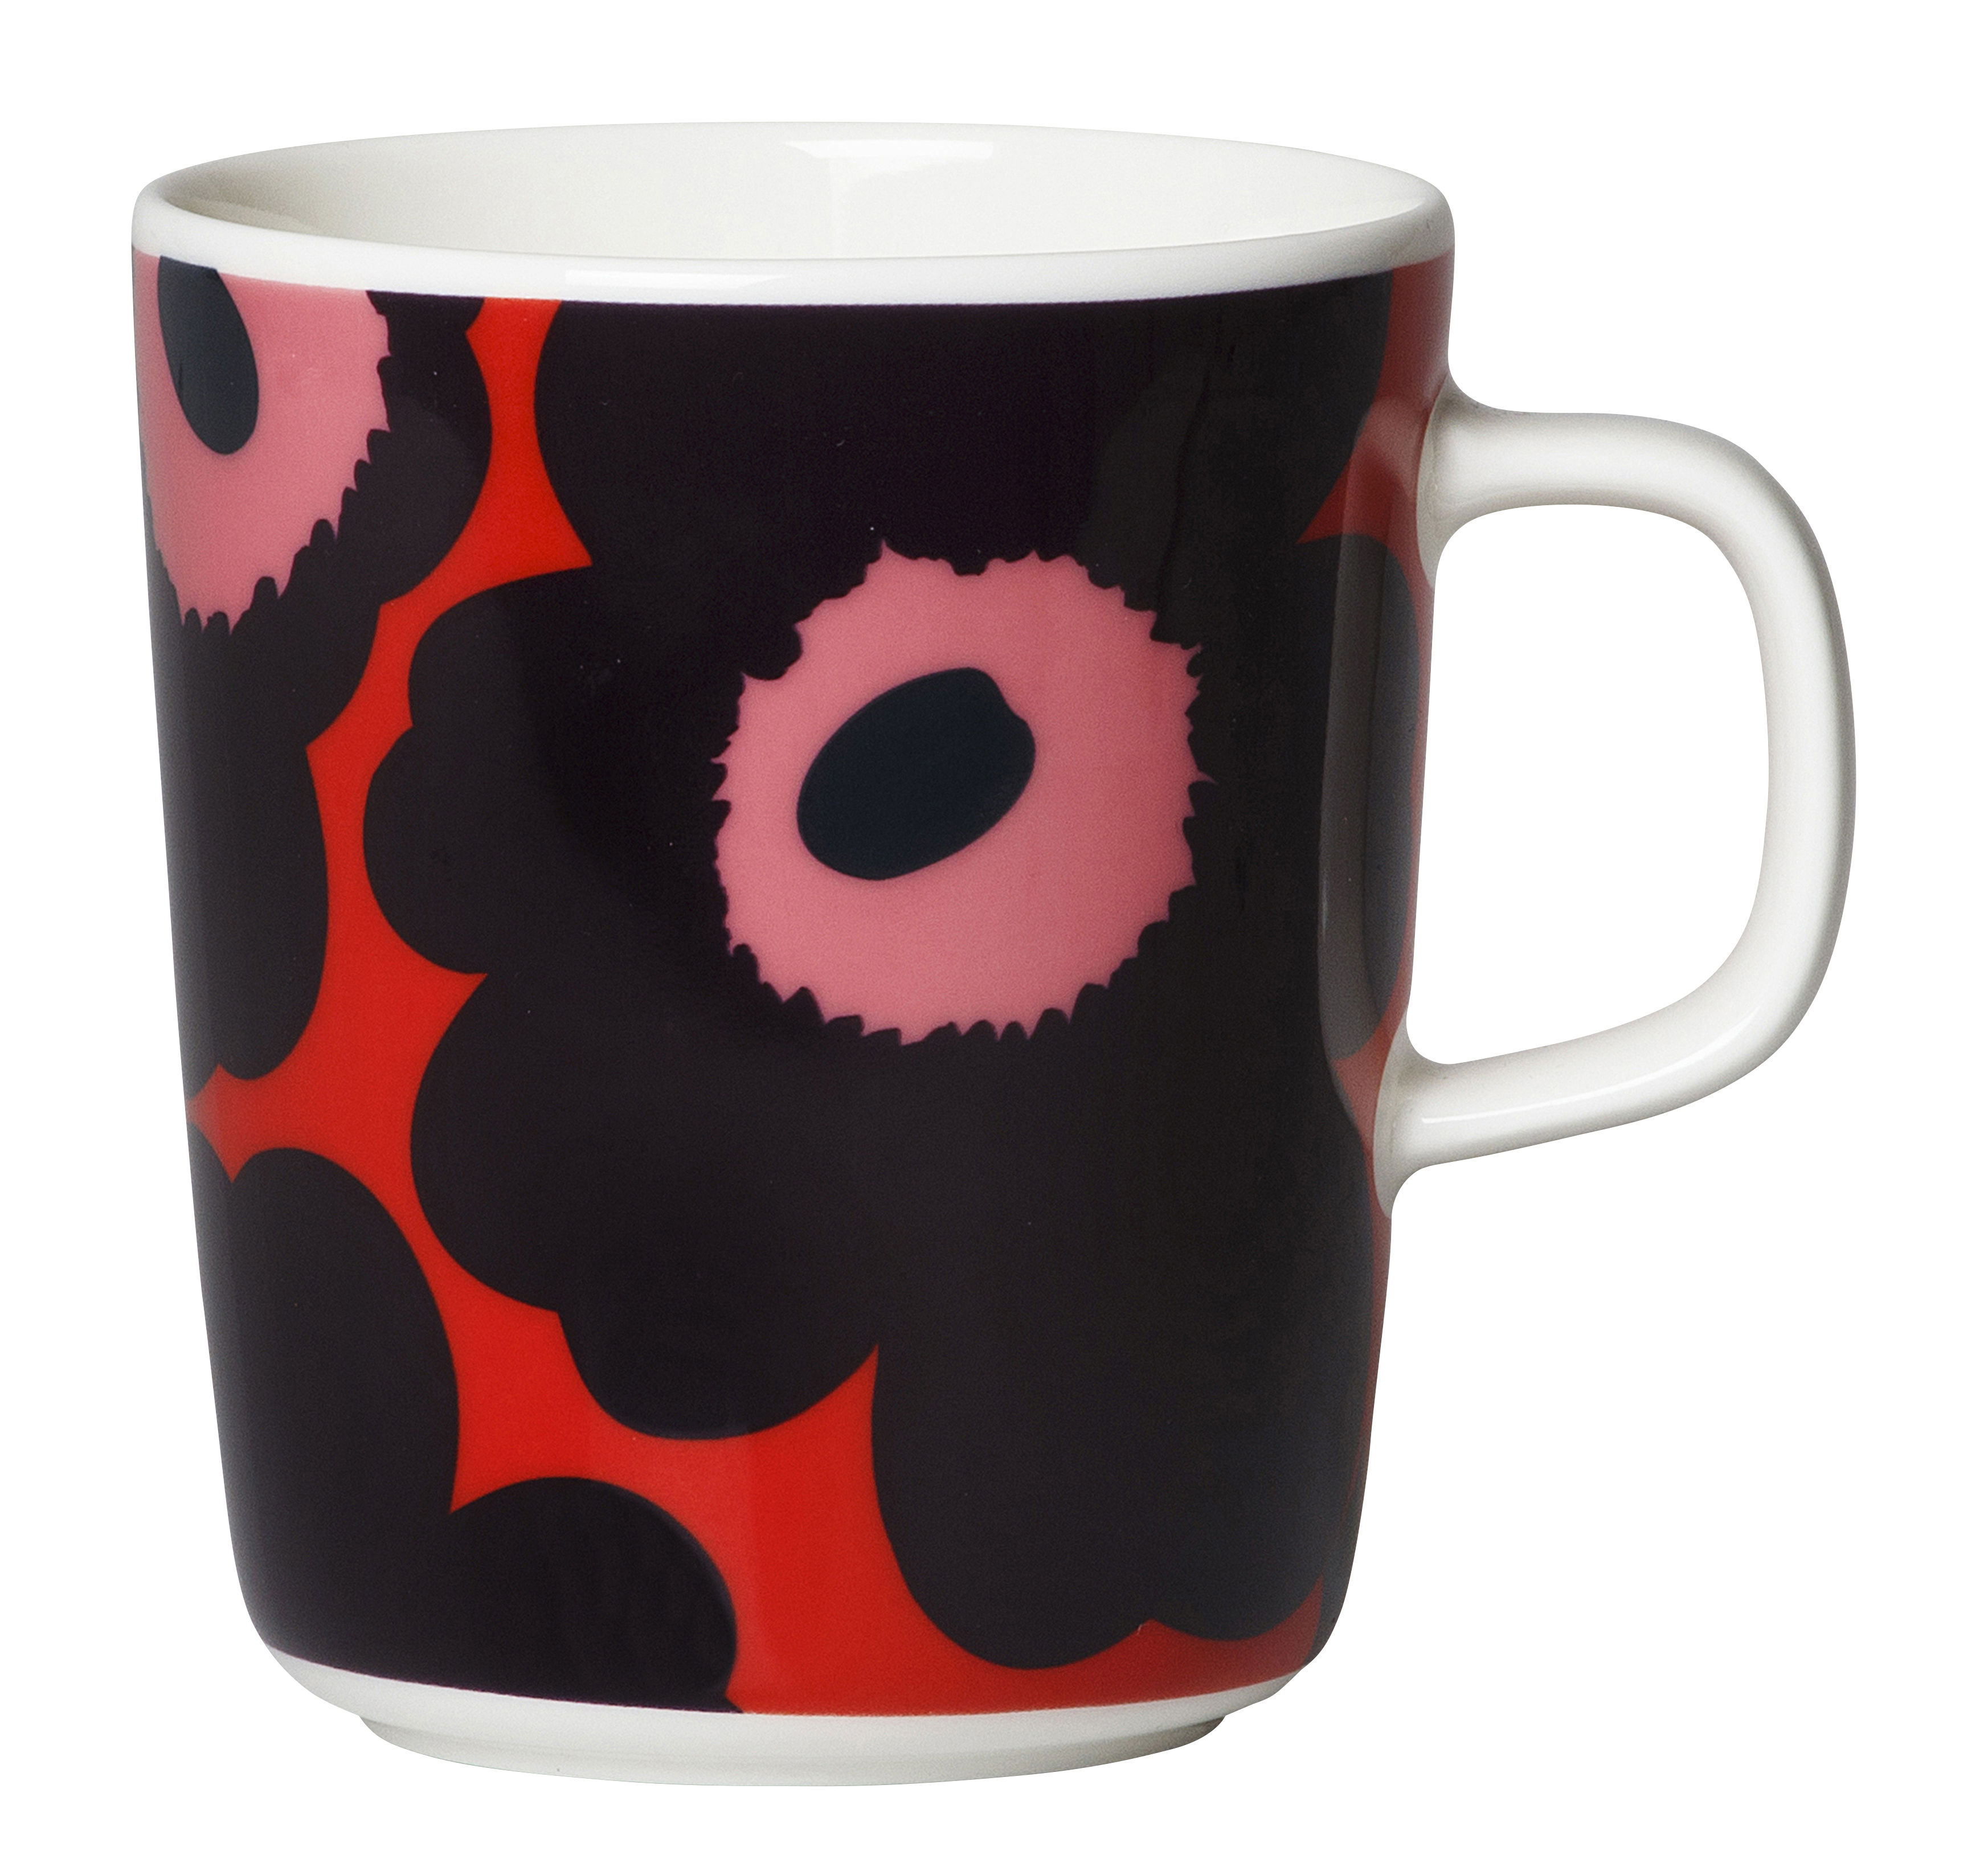 Arts de la table - Tasses et mugs - Mug Unikko / 40 cl - Marimekko - Unikko / Rouge, violet - Grès